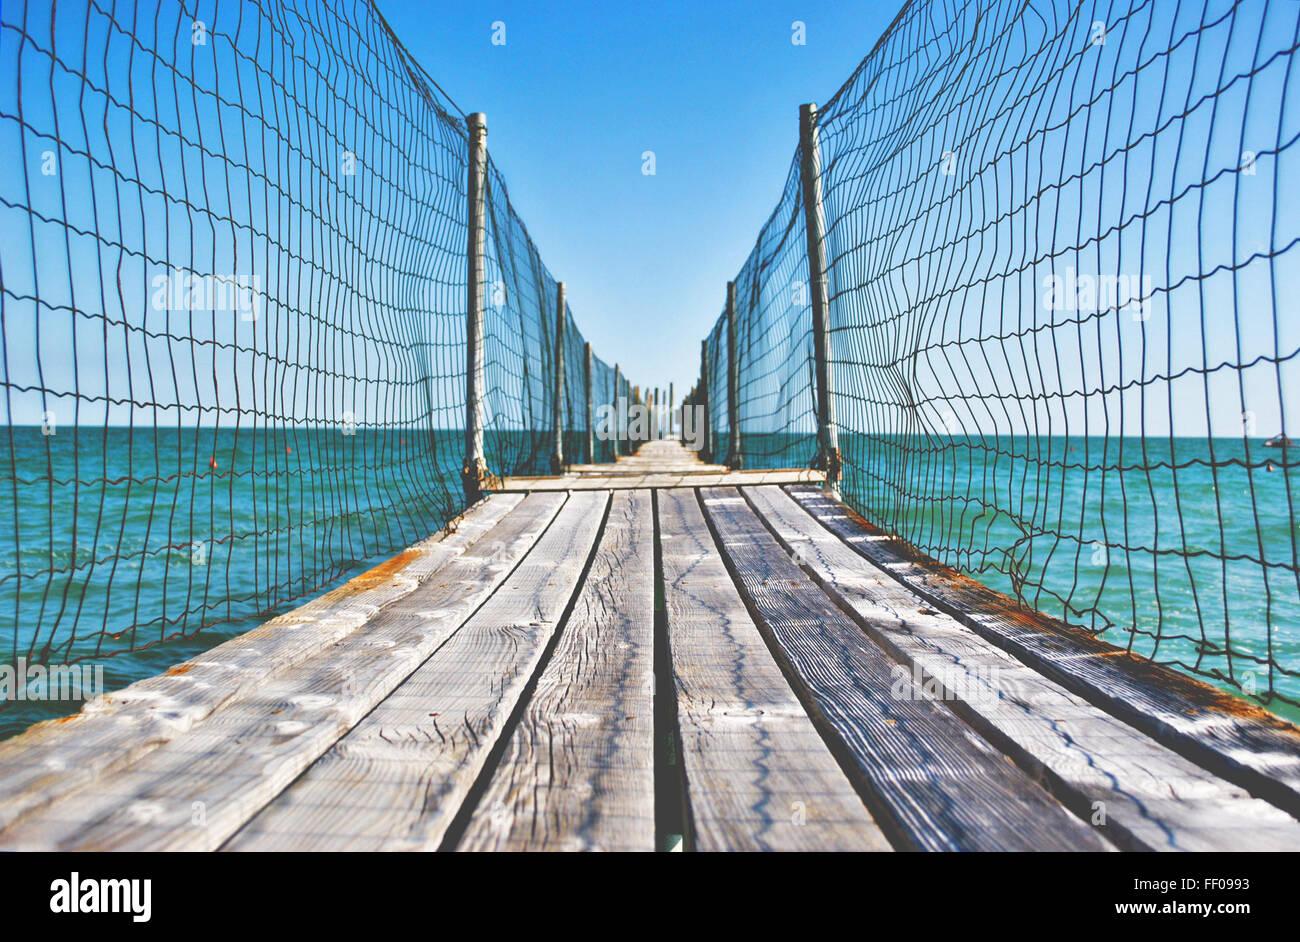 Fenced Wooden Boardwalk Over Ocean Fenced Wooden Boardwalk Over Ocean - Stock Image